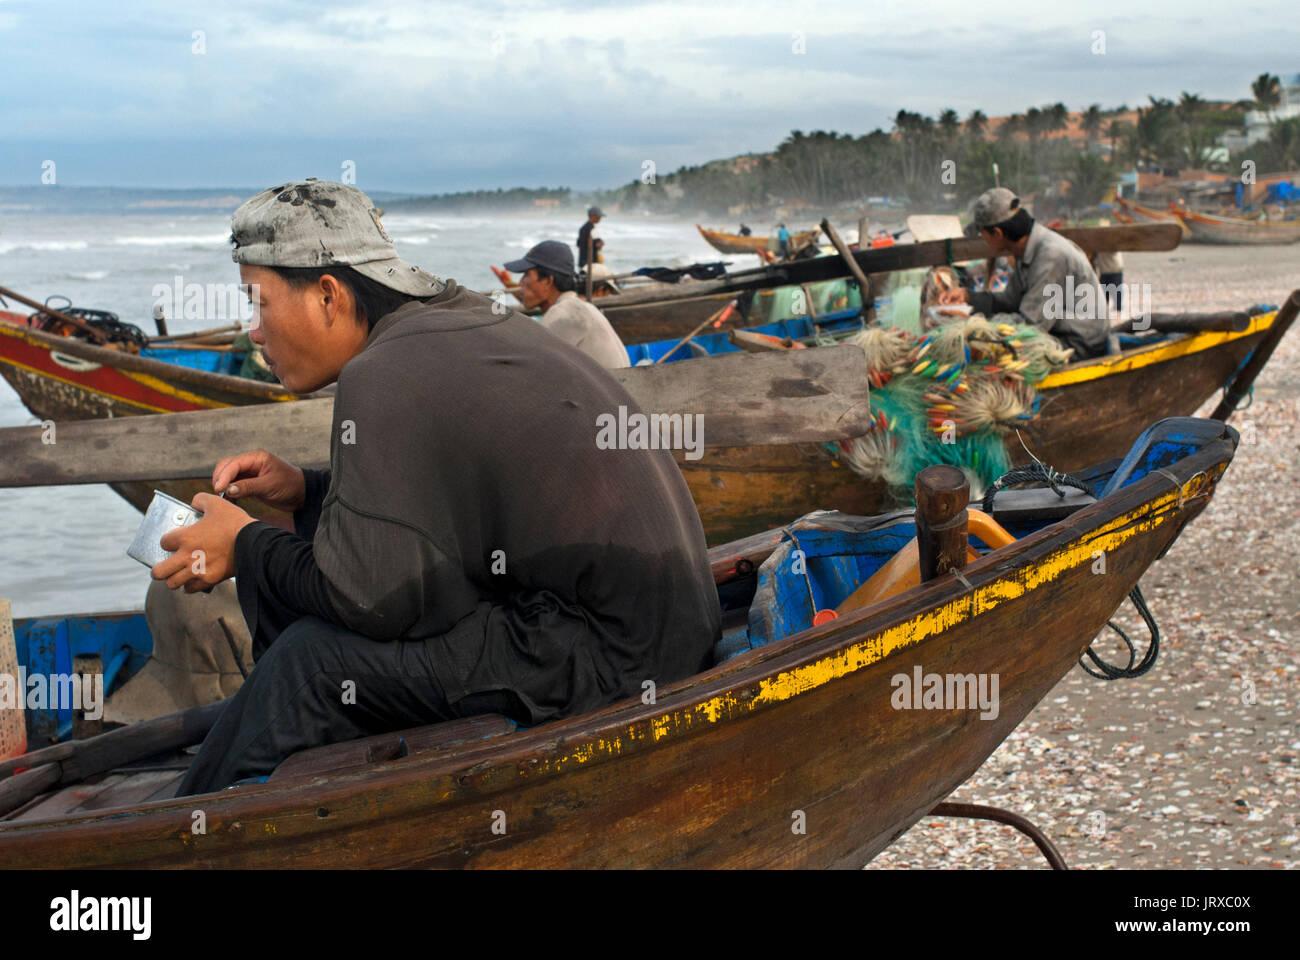 Vietnam, Mui Ne, Mui Ne Beach, Fishing Catch. fishing village, Bình Thuận Province, Vietnam. Stock Photo